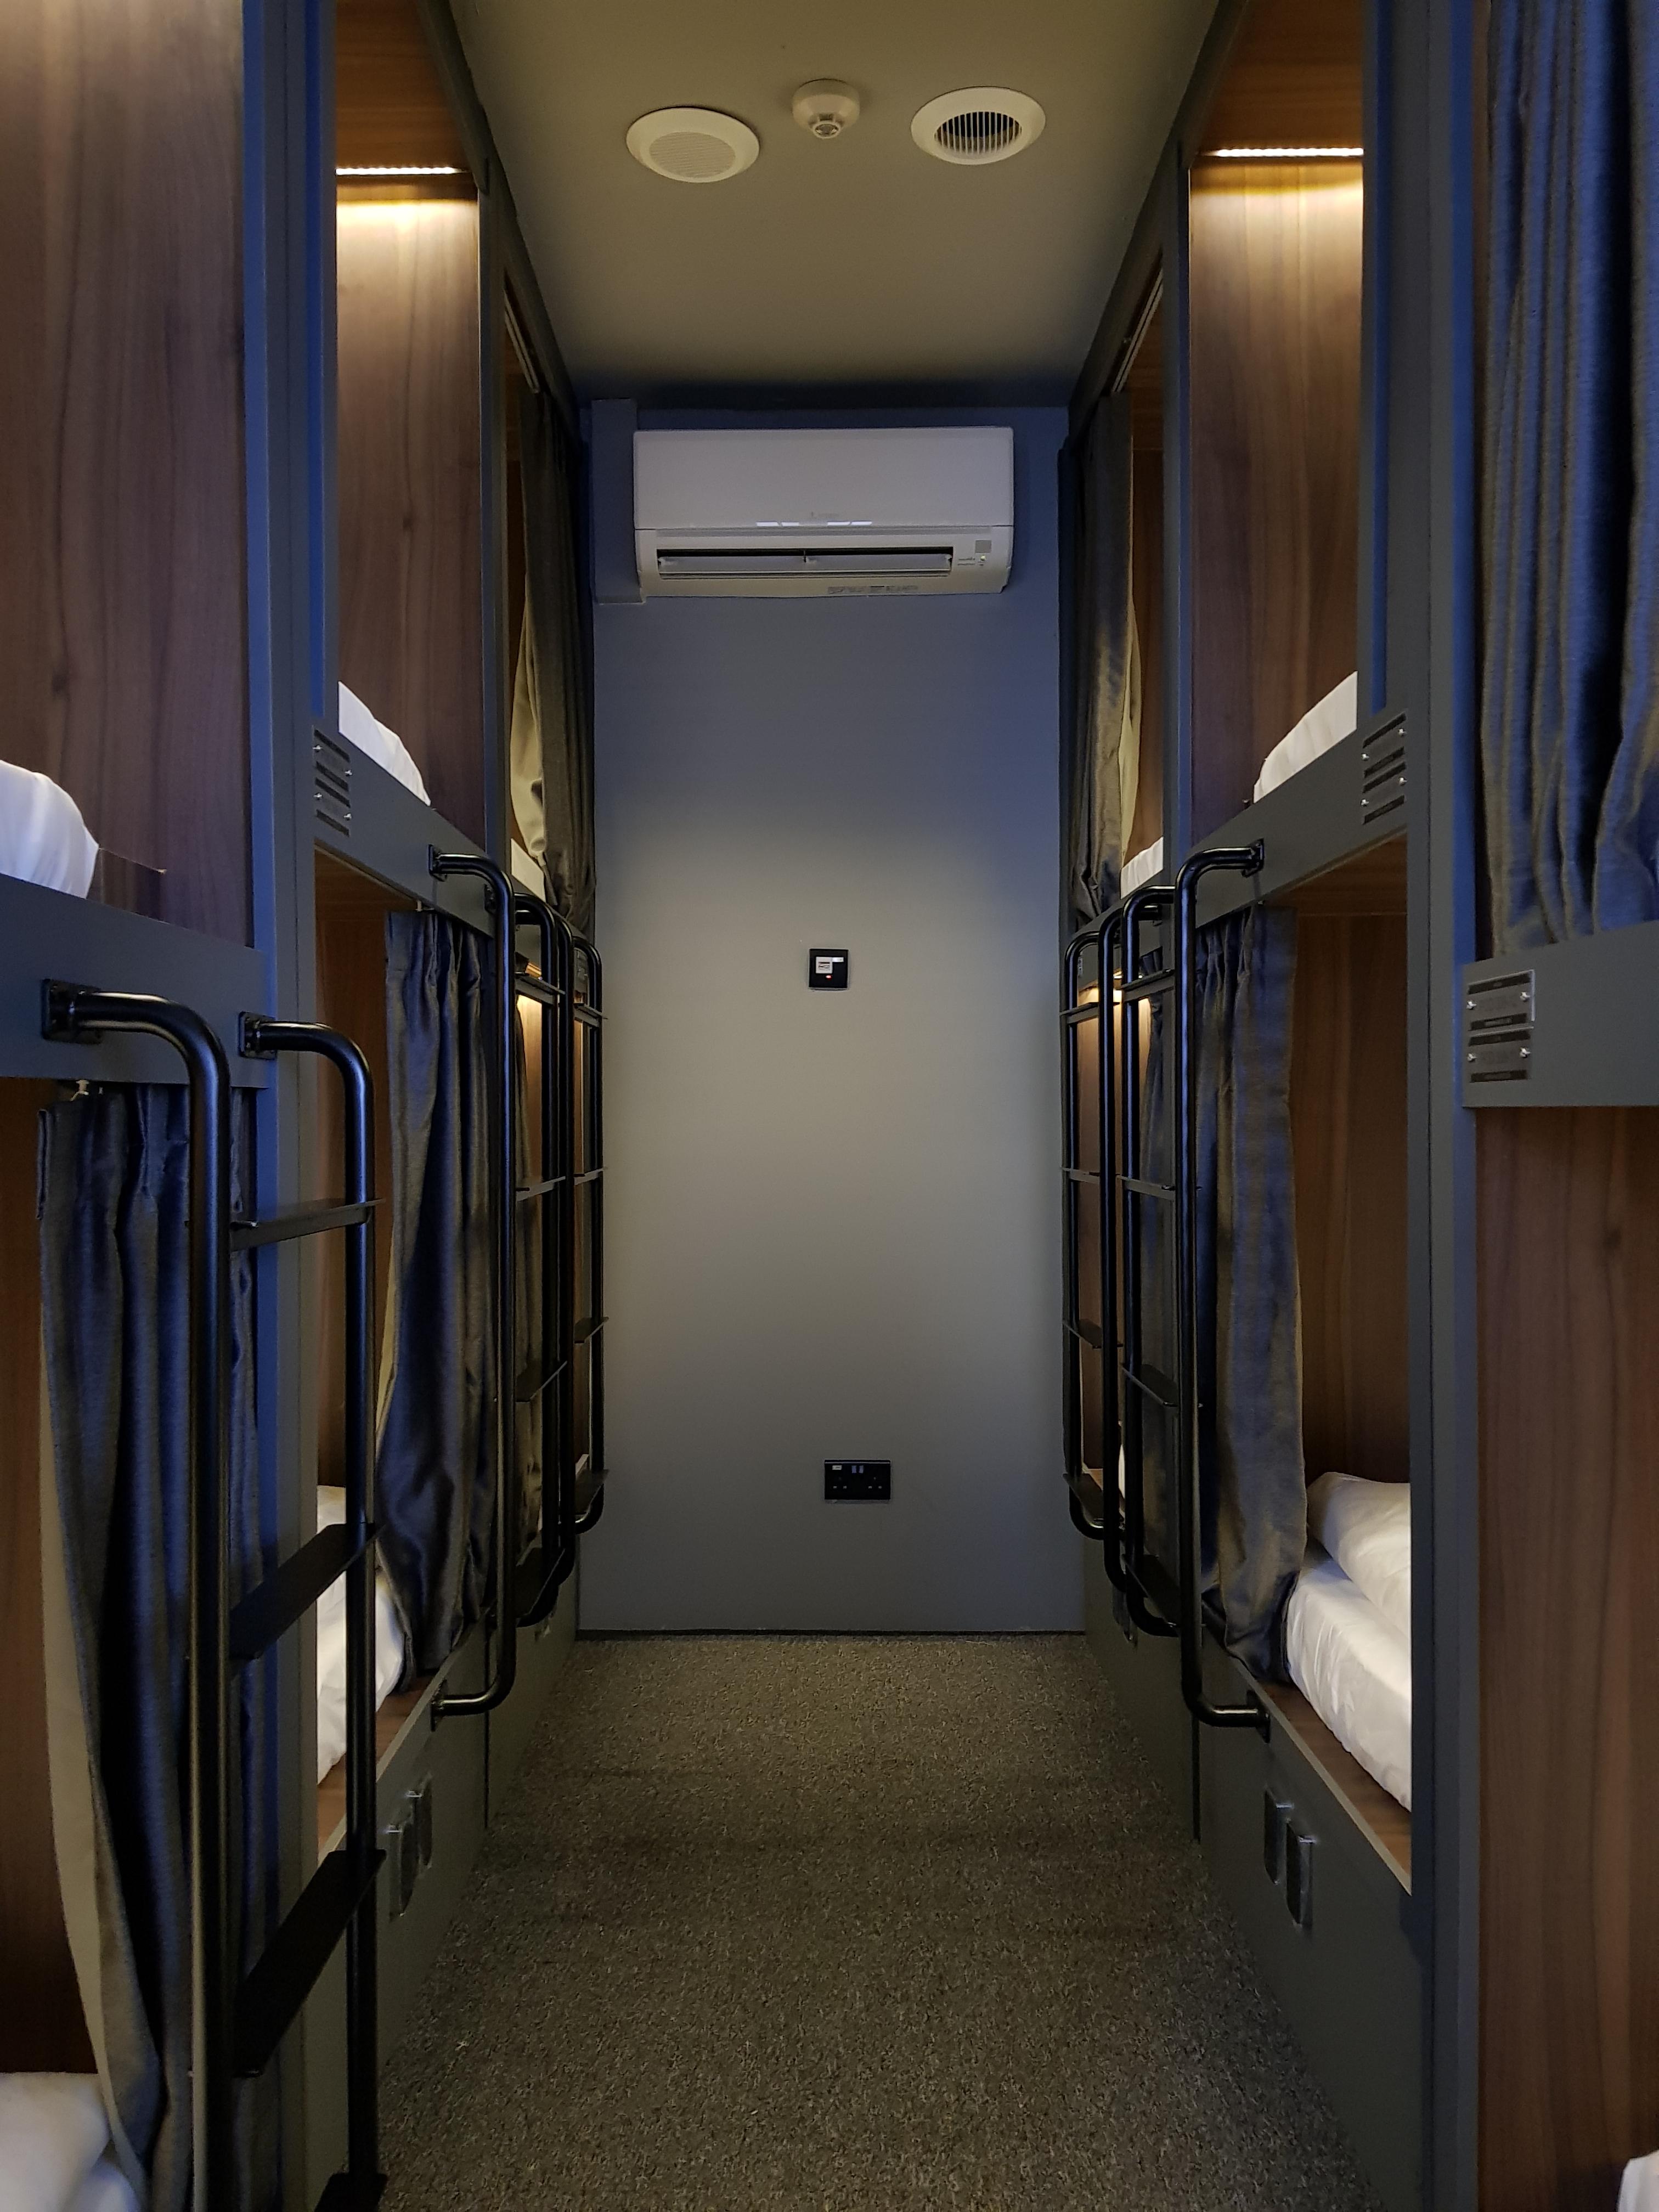 Room 308 02 - 3024x4032